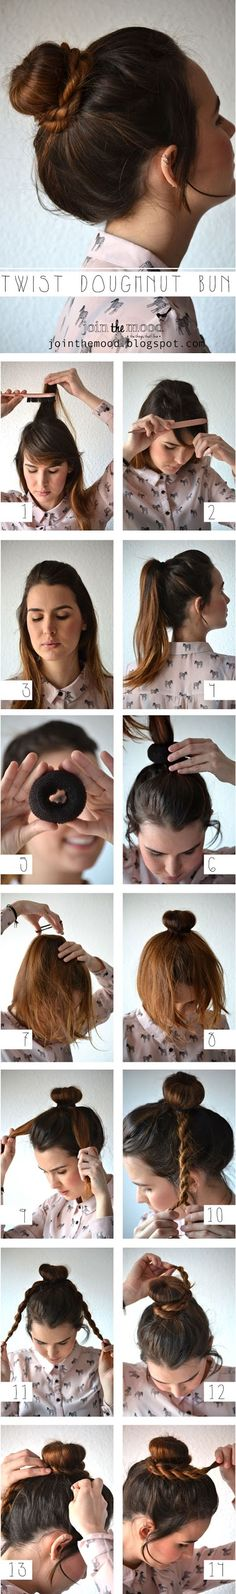 The Best 25 Useful Hair Tutorials Ever, Twist Doughnut Bun For Your Hair